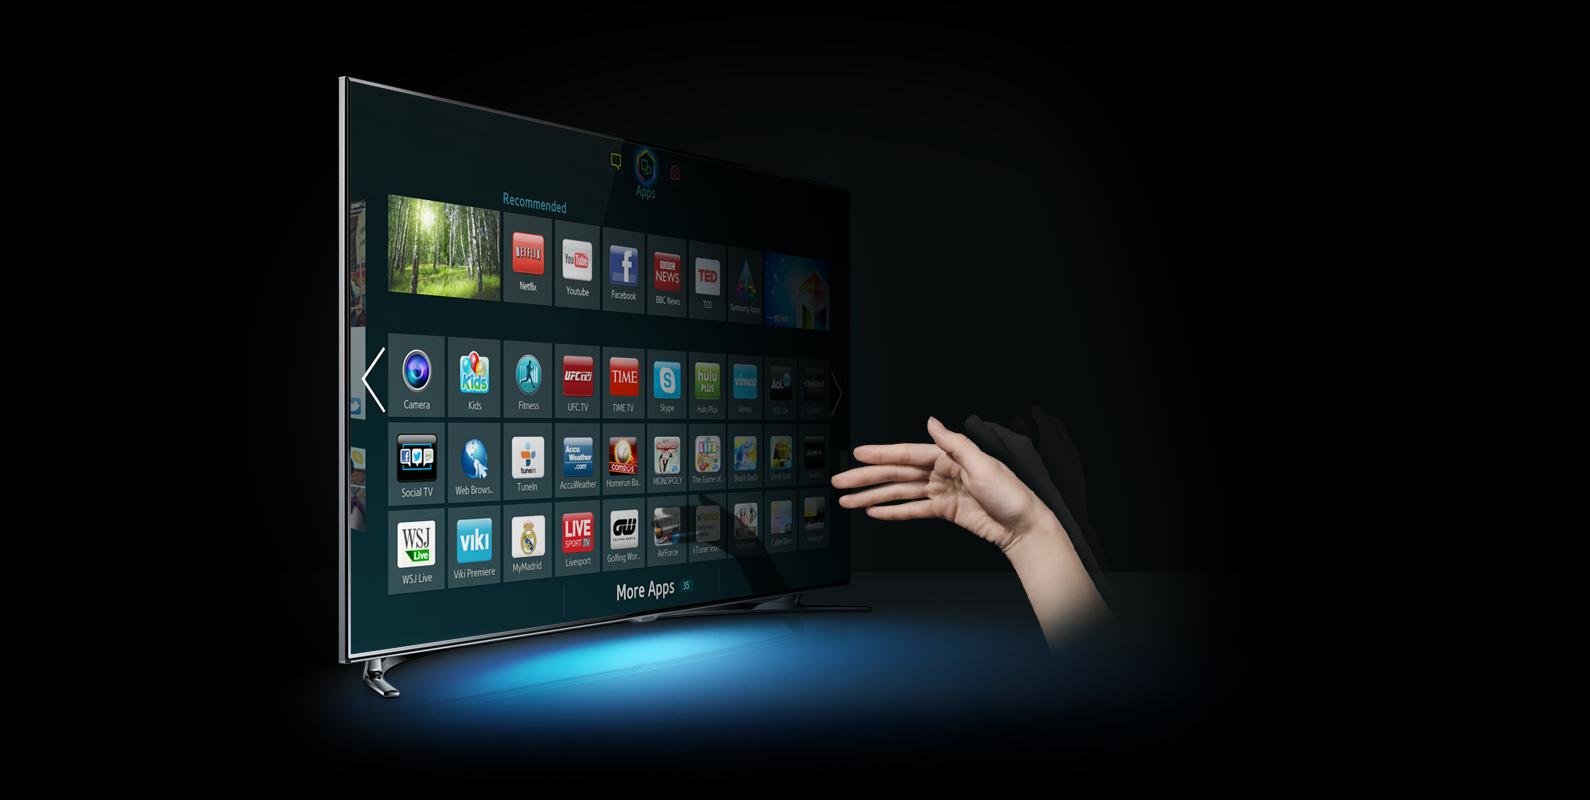 Hack a Samsung Smart TV via DVB-T